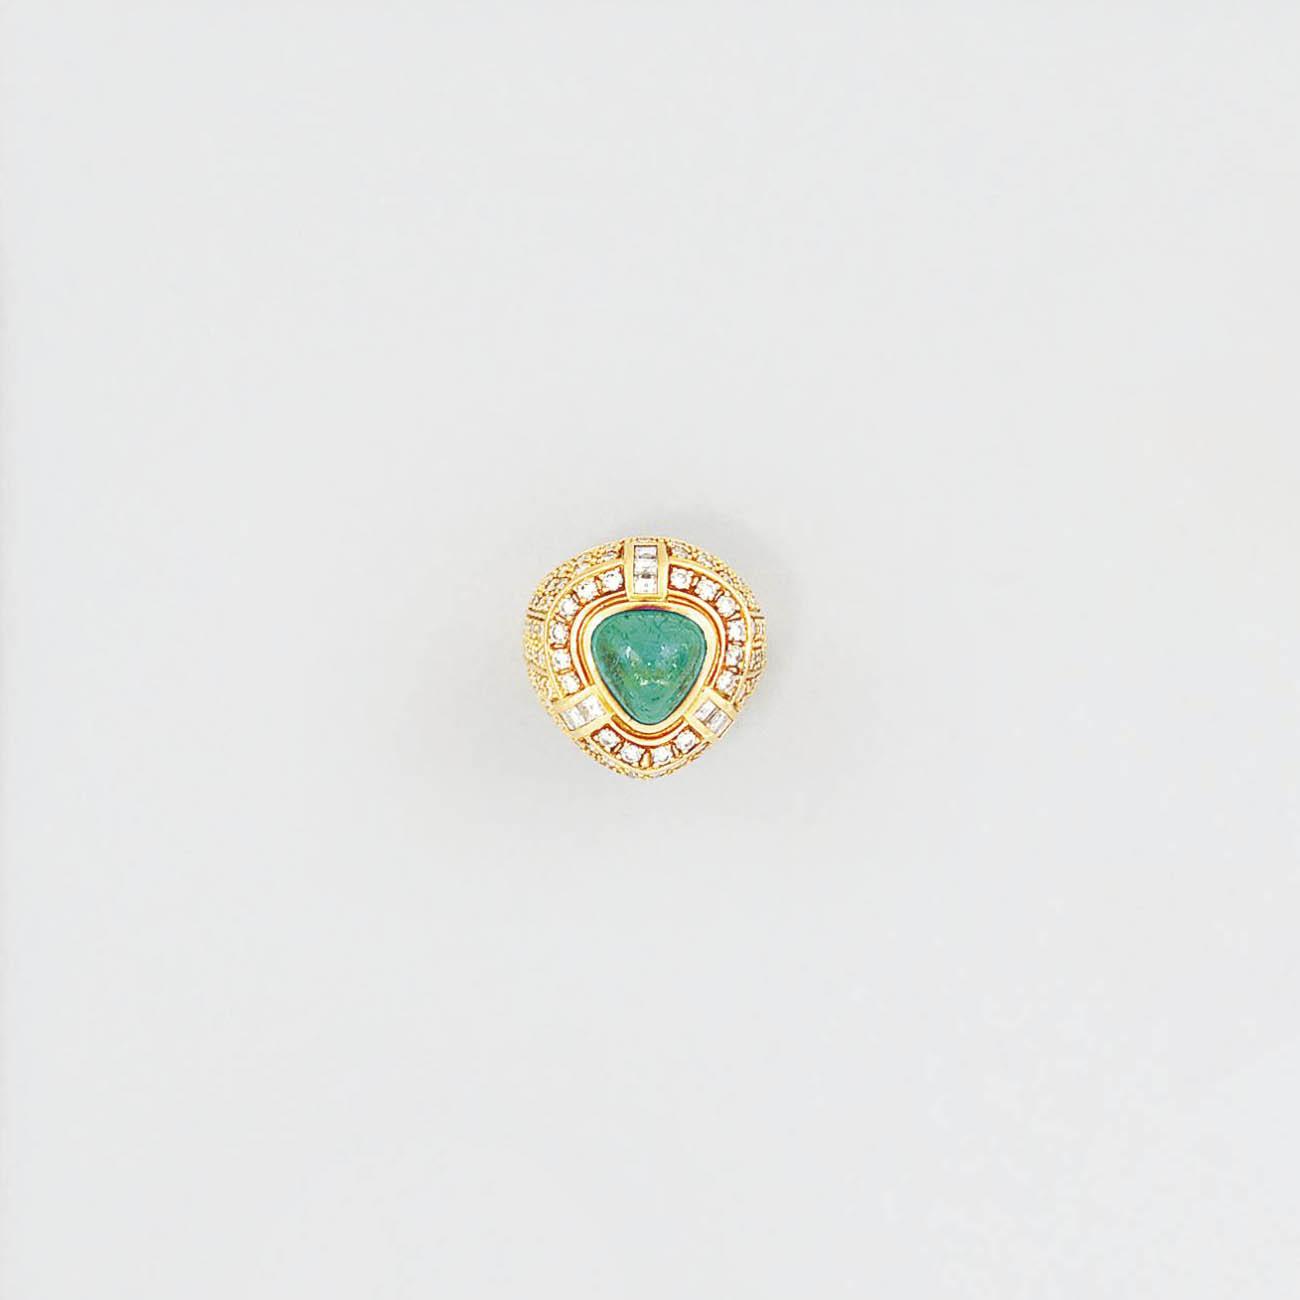 An emerald and diamond dress r